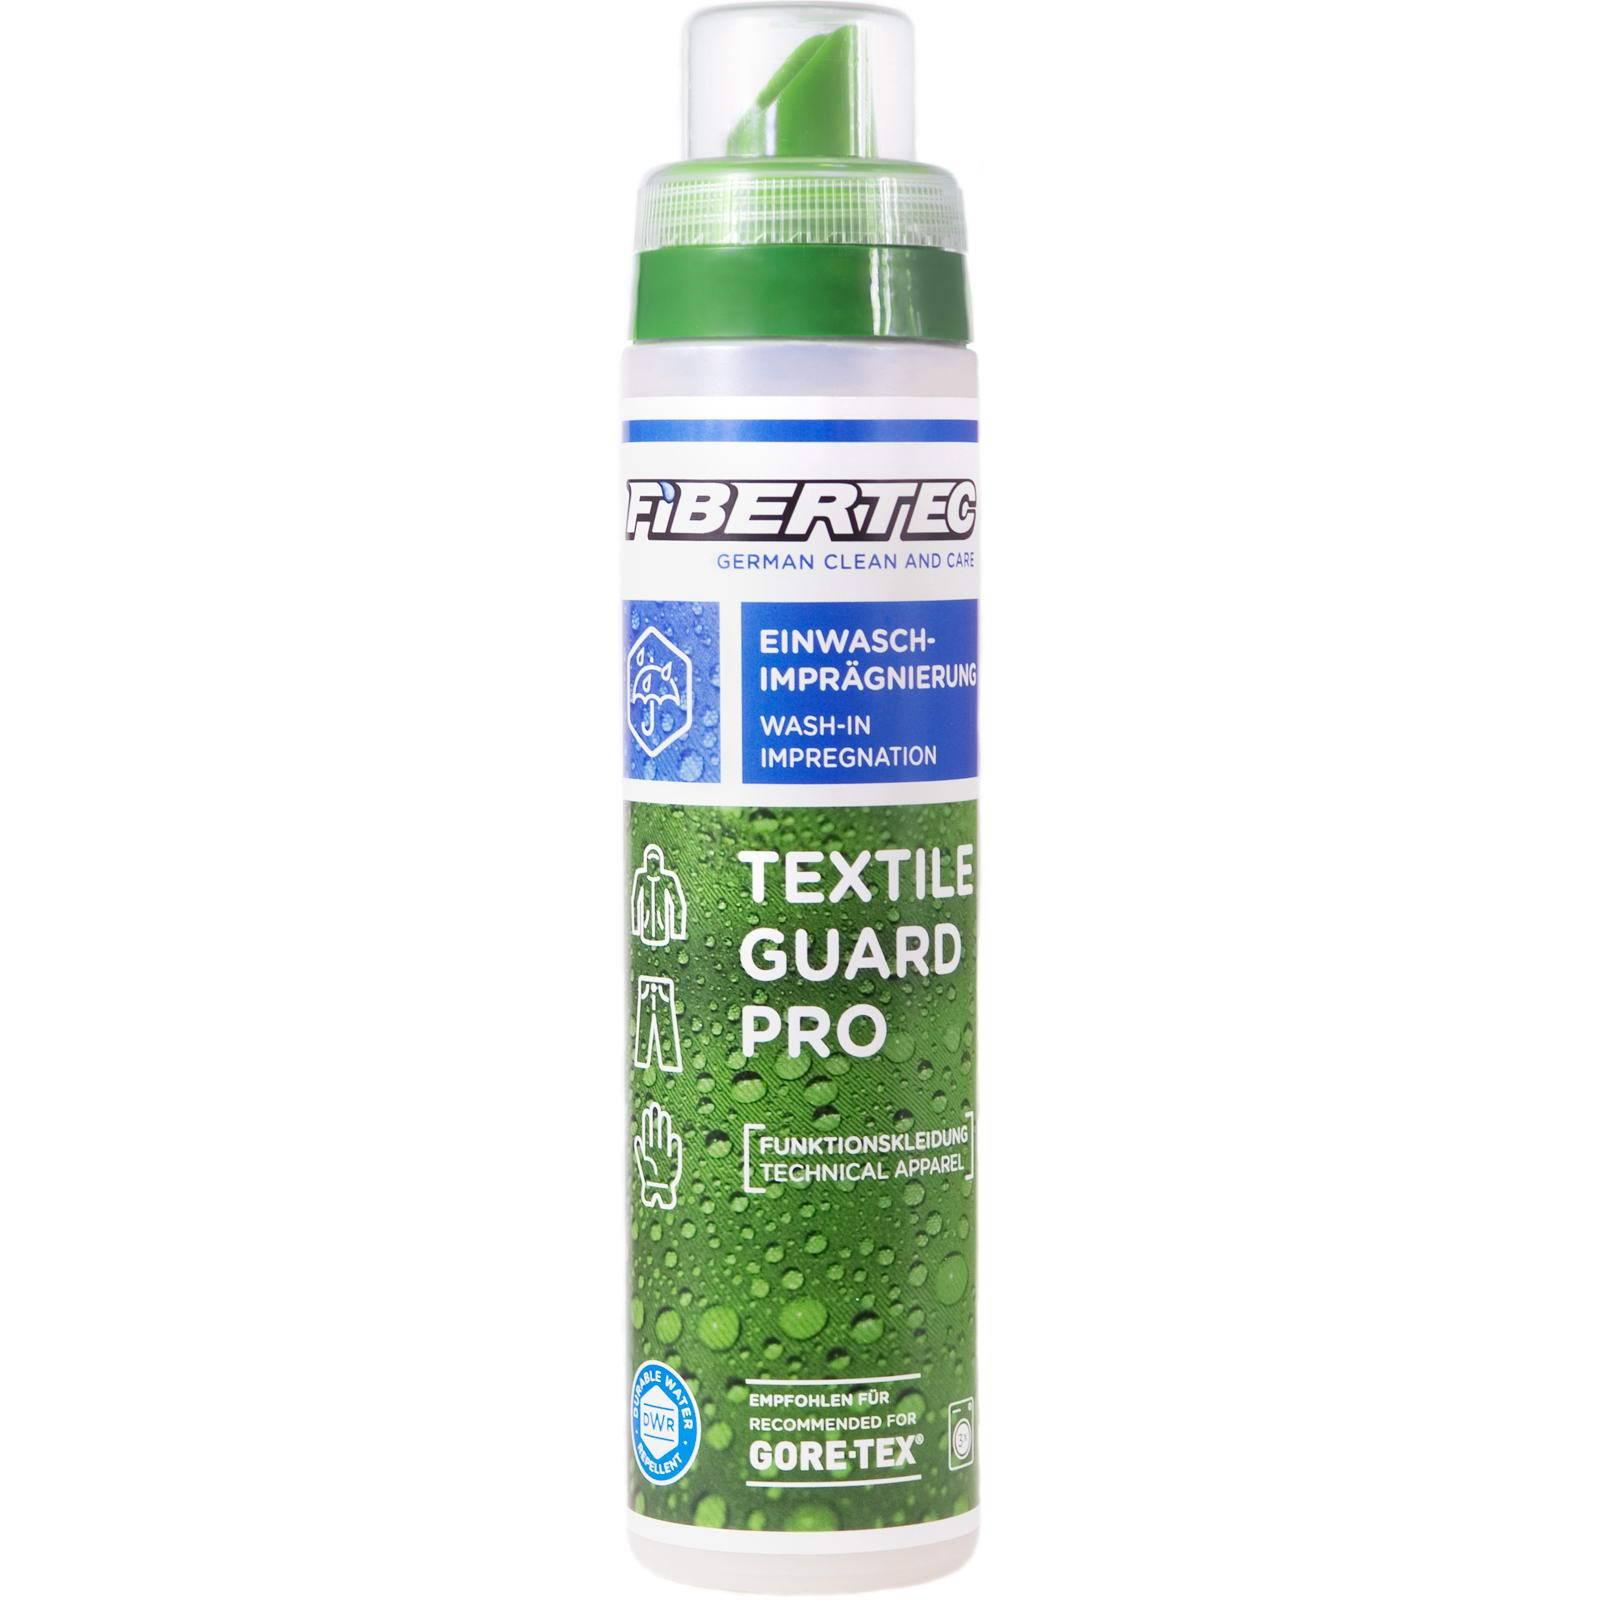 FIBERTEC Textile Guard Pro Wash-In 250 ml - Imprägnierung - Bild 1